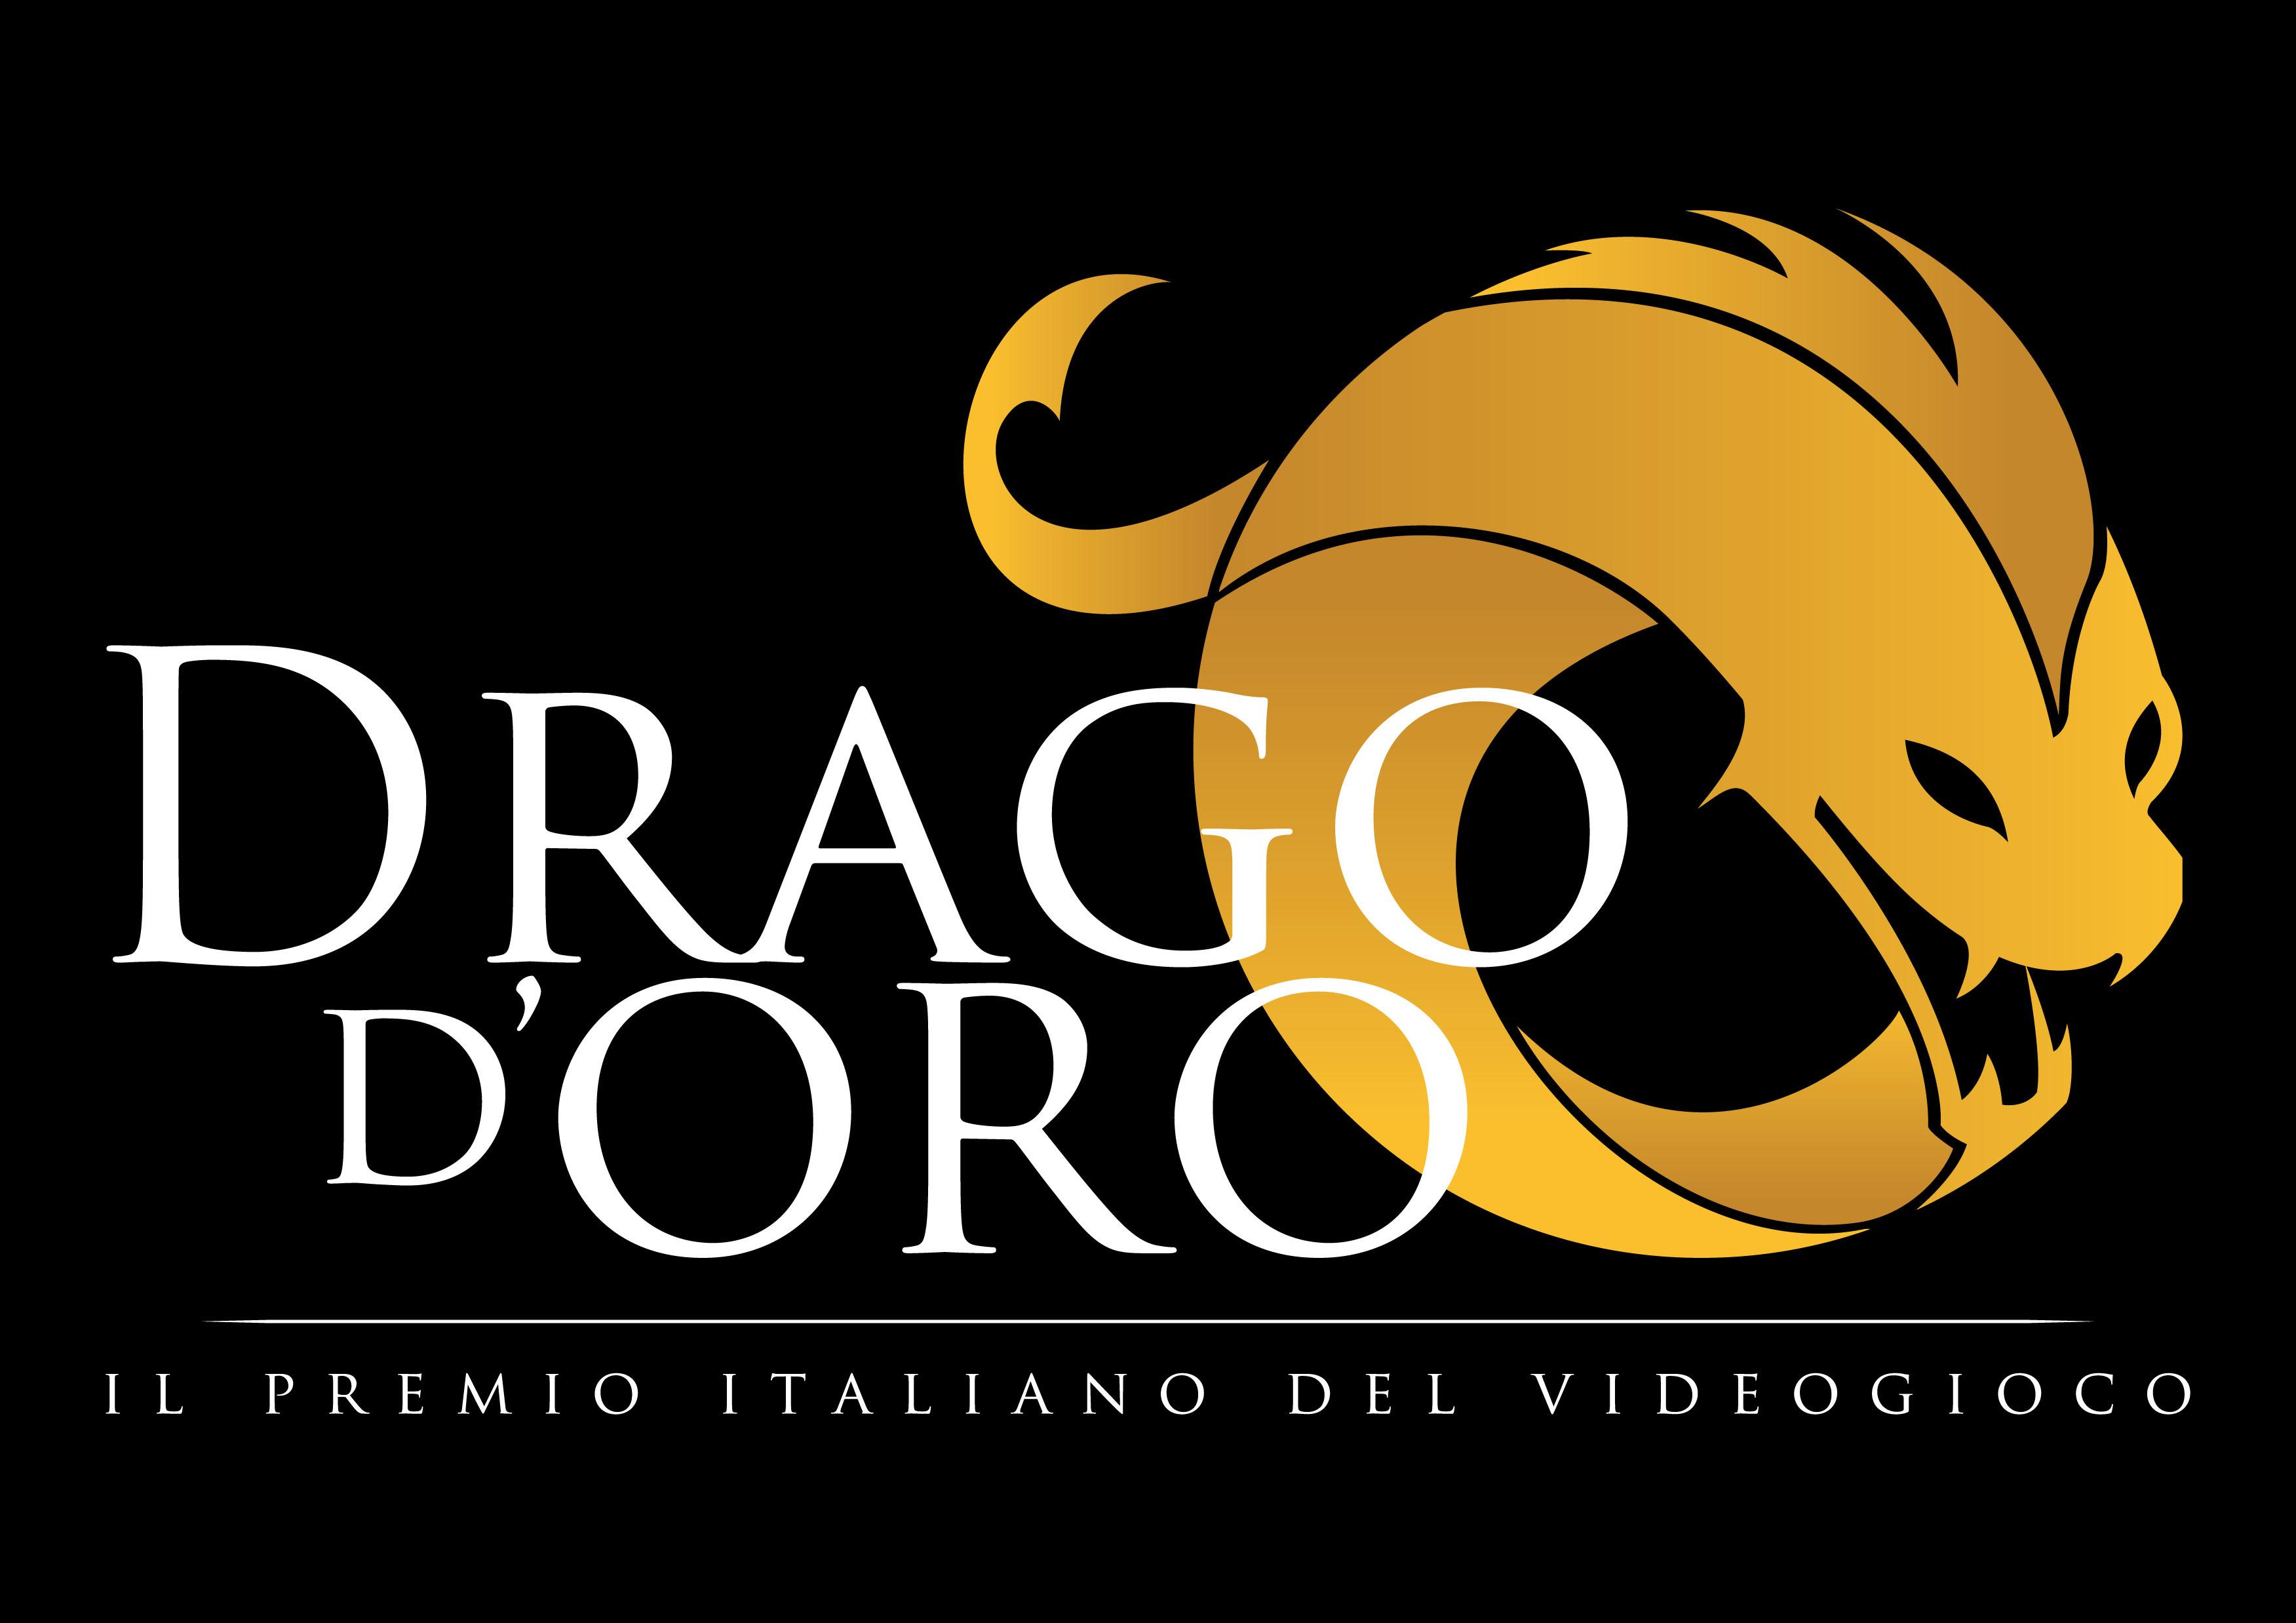 drag_d'oro nero